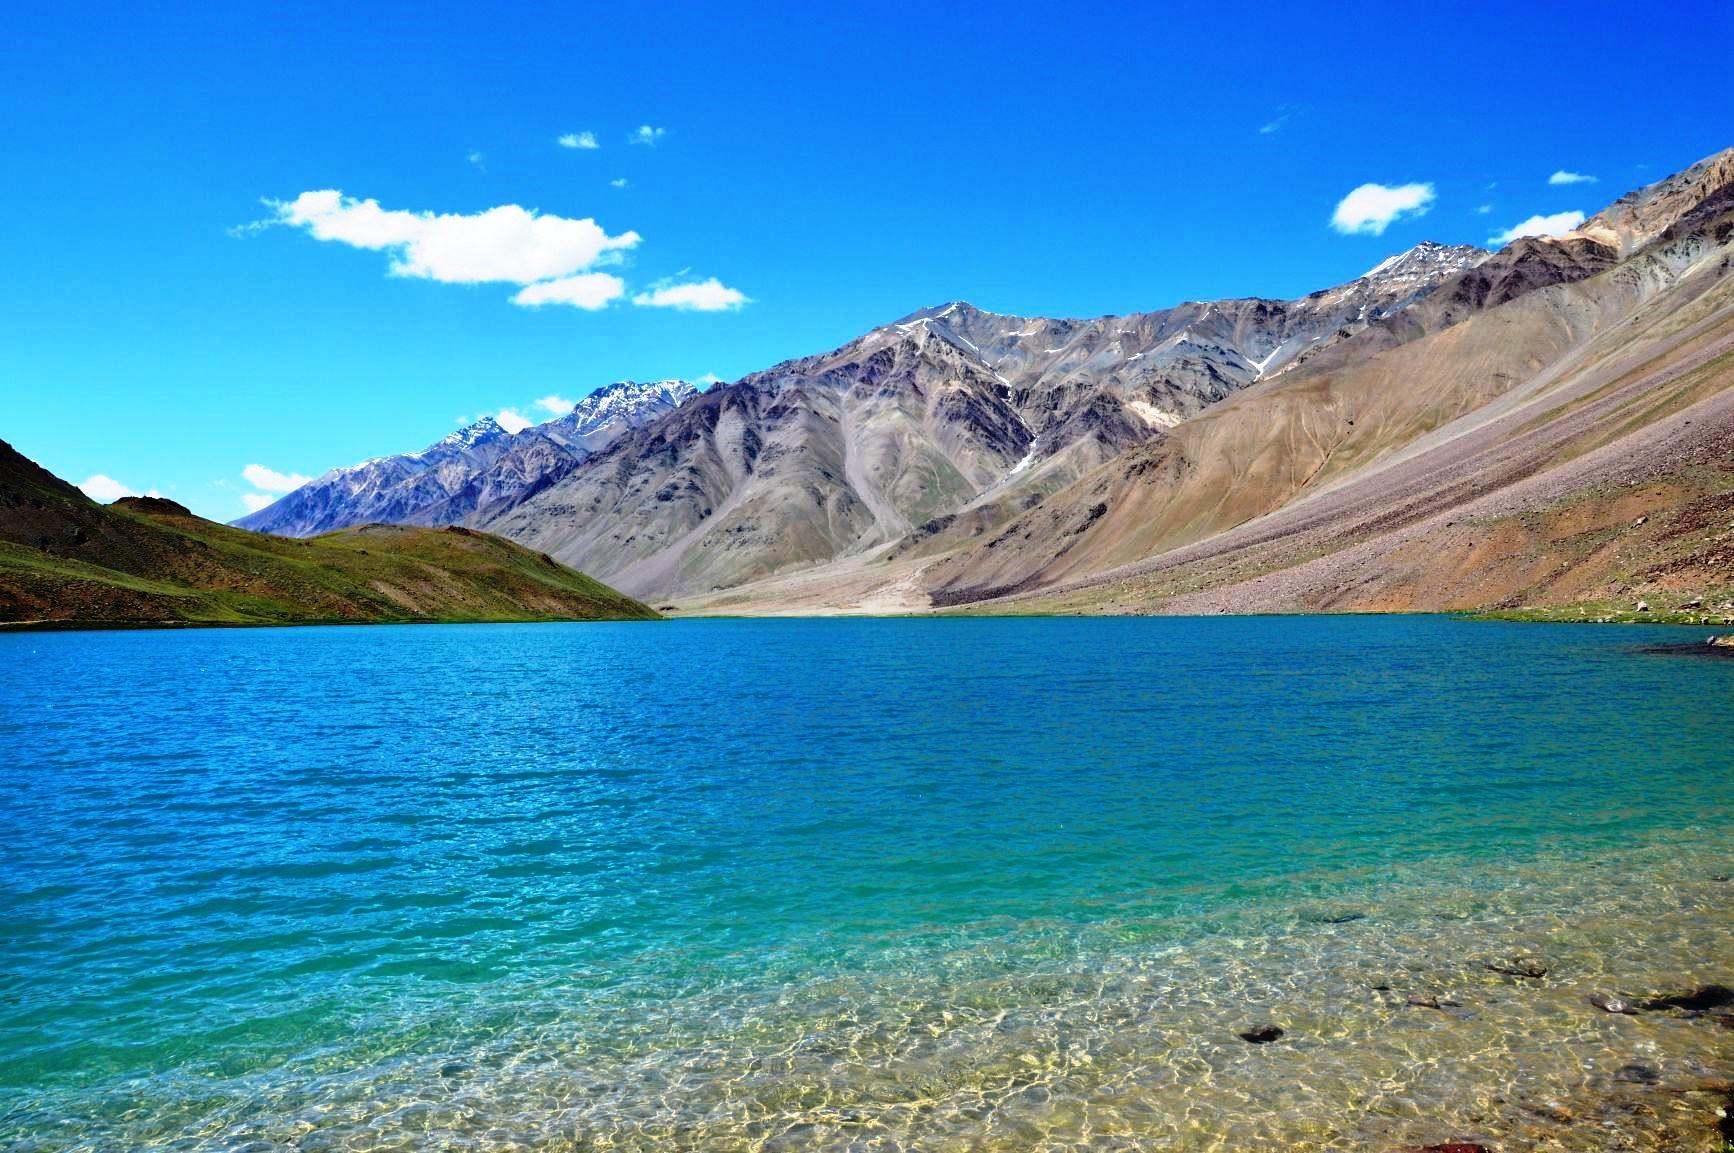 charm-of-chandratal-lake